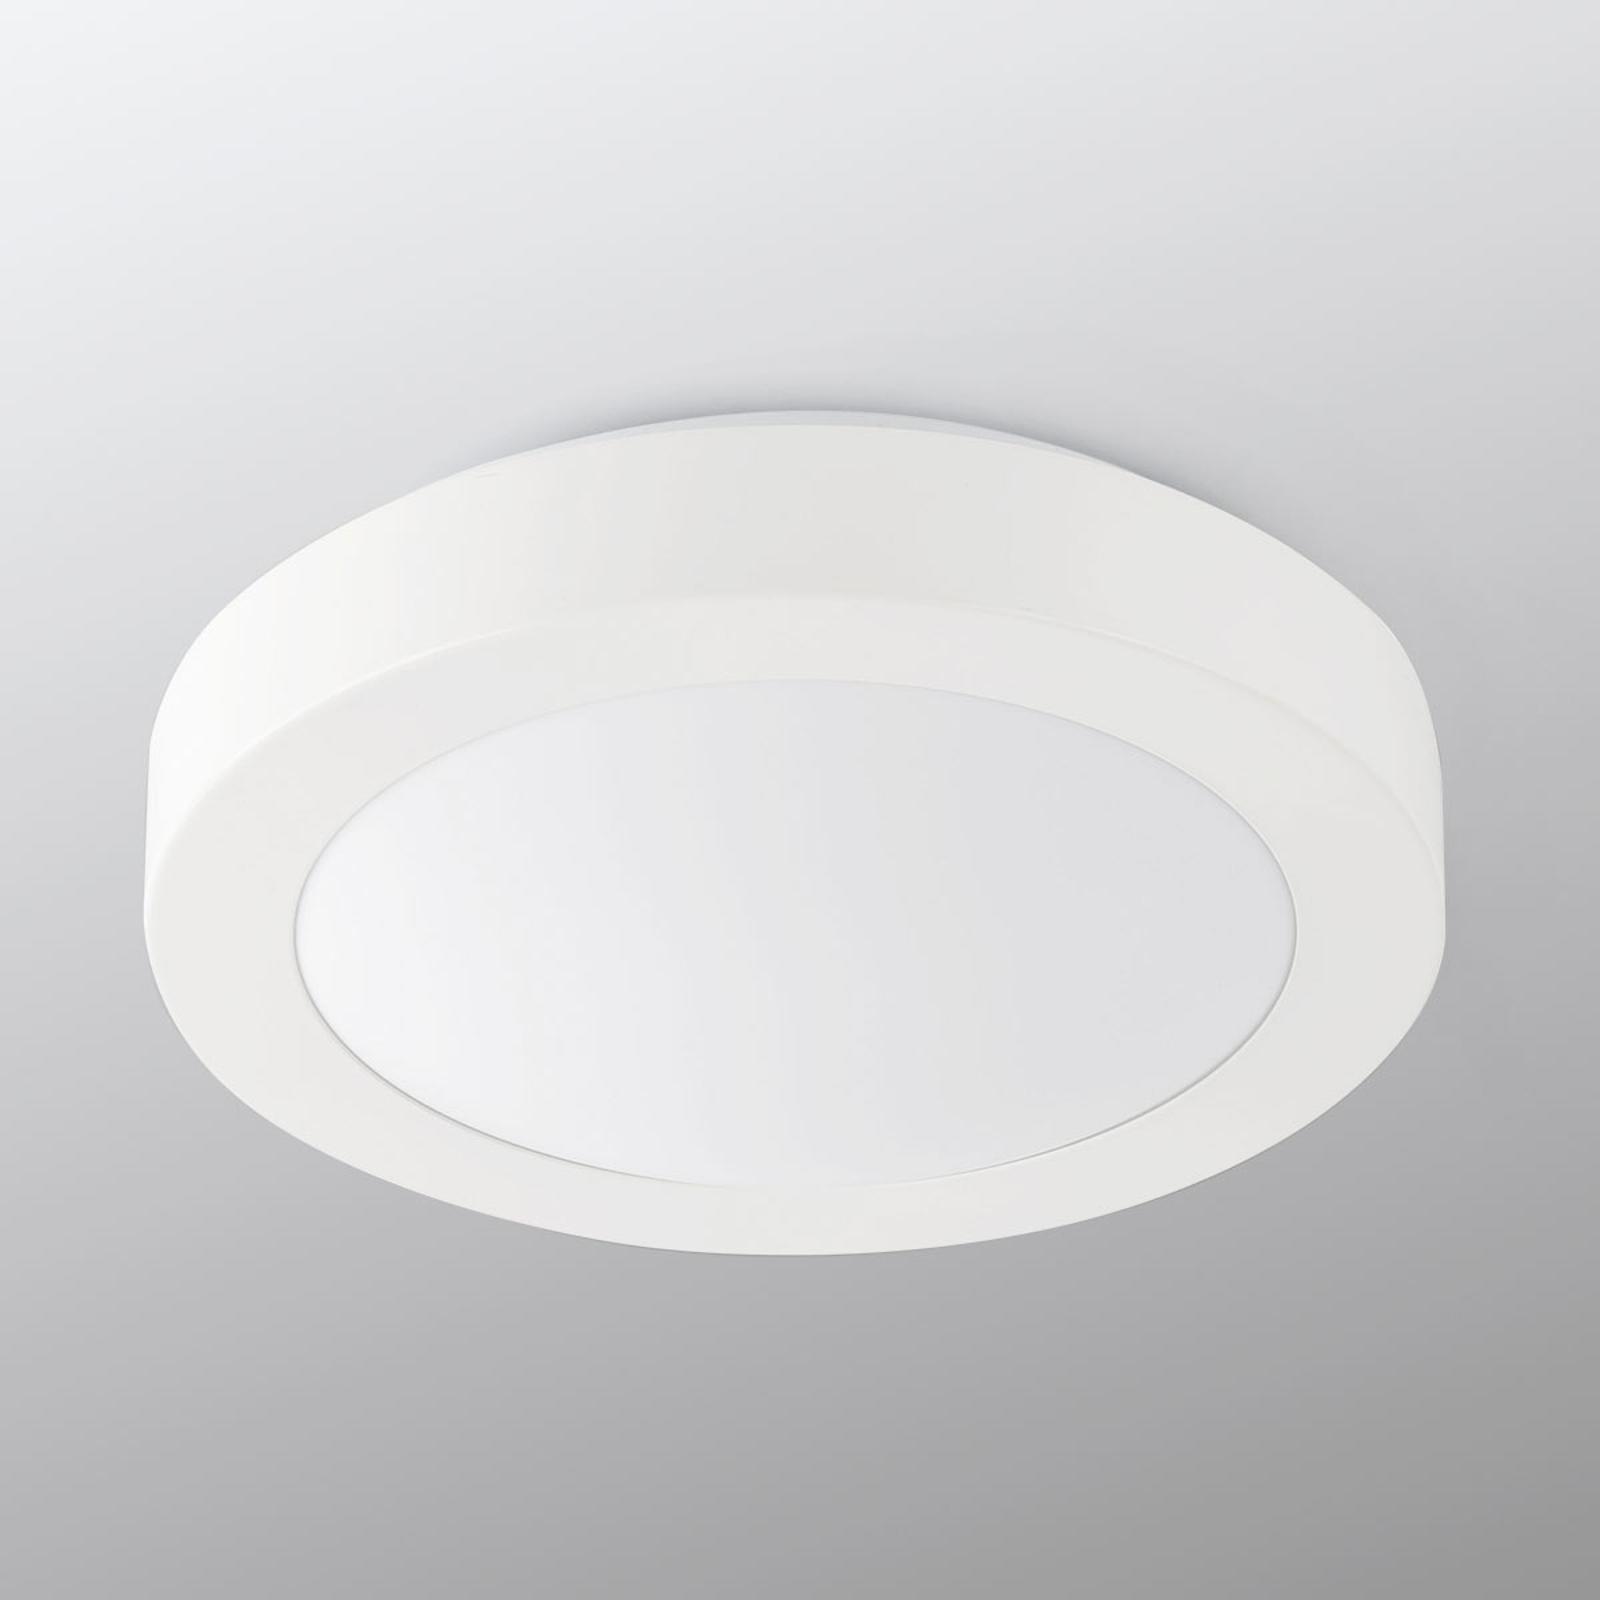 Ronde LED badkamer plafondlamp Logos Ø 27 cm